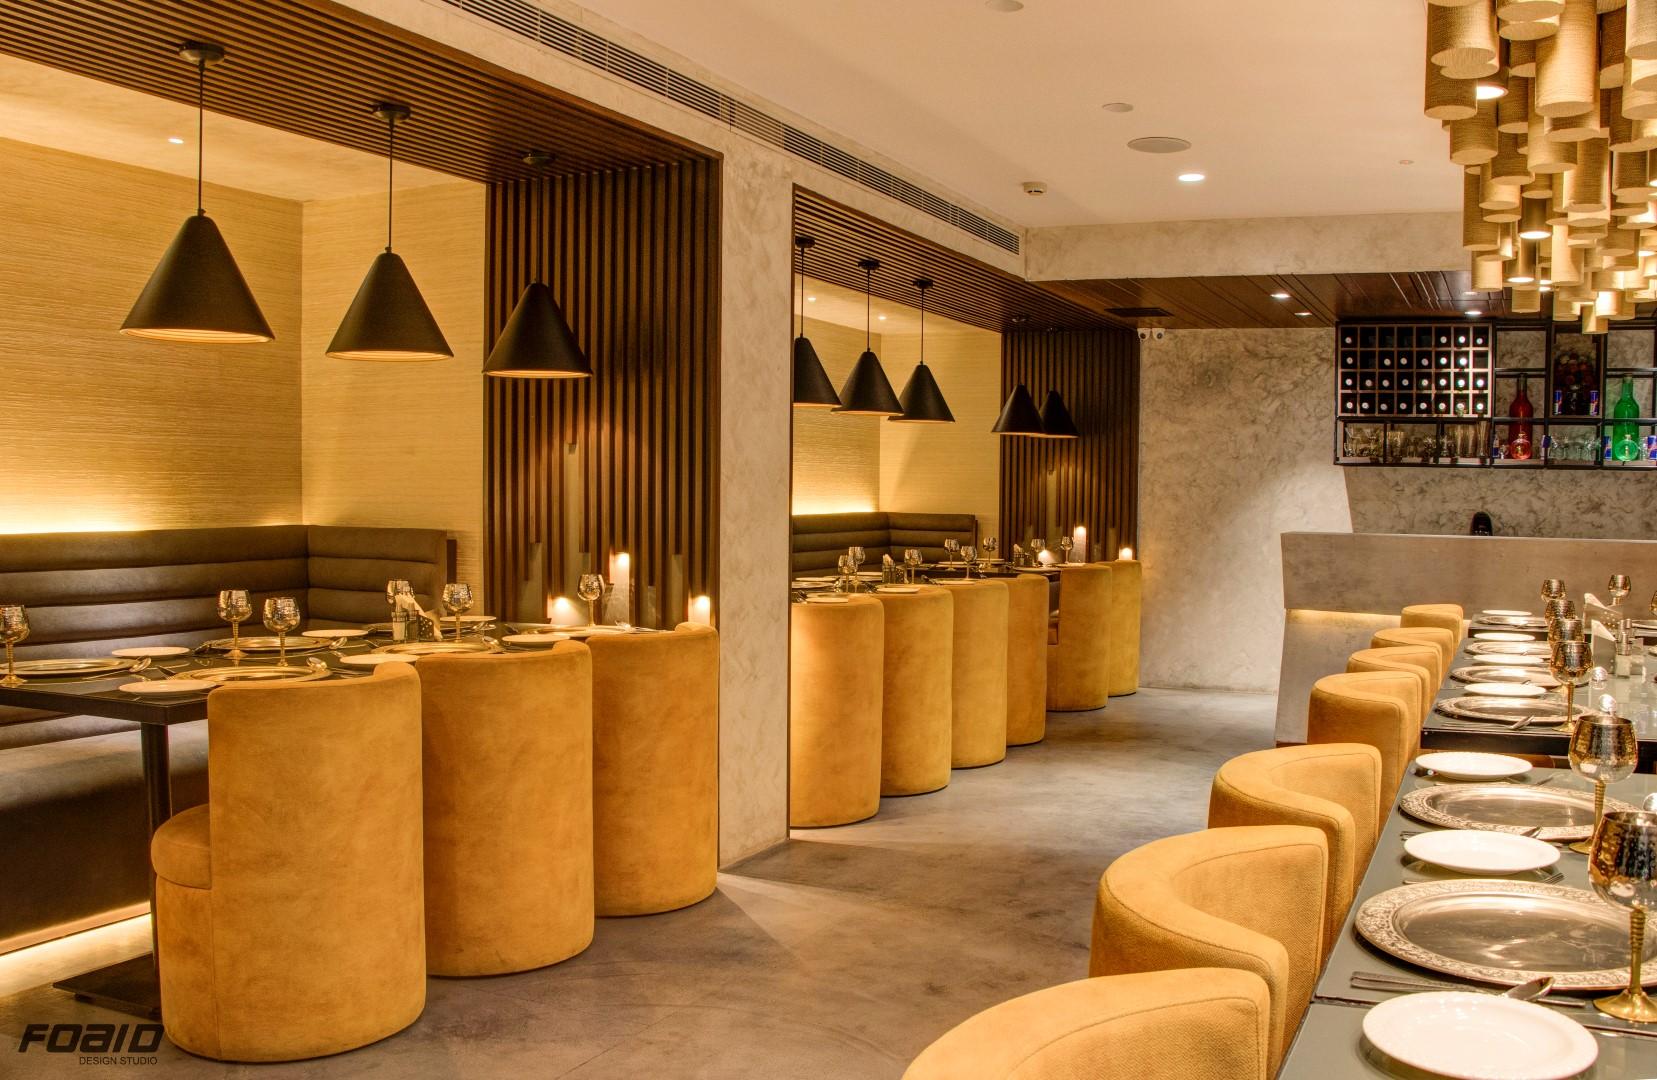 Jalpaan restaurant interiors is adaption of indian modernstyle foaid